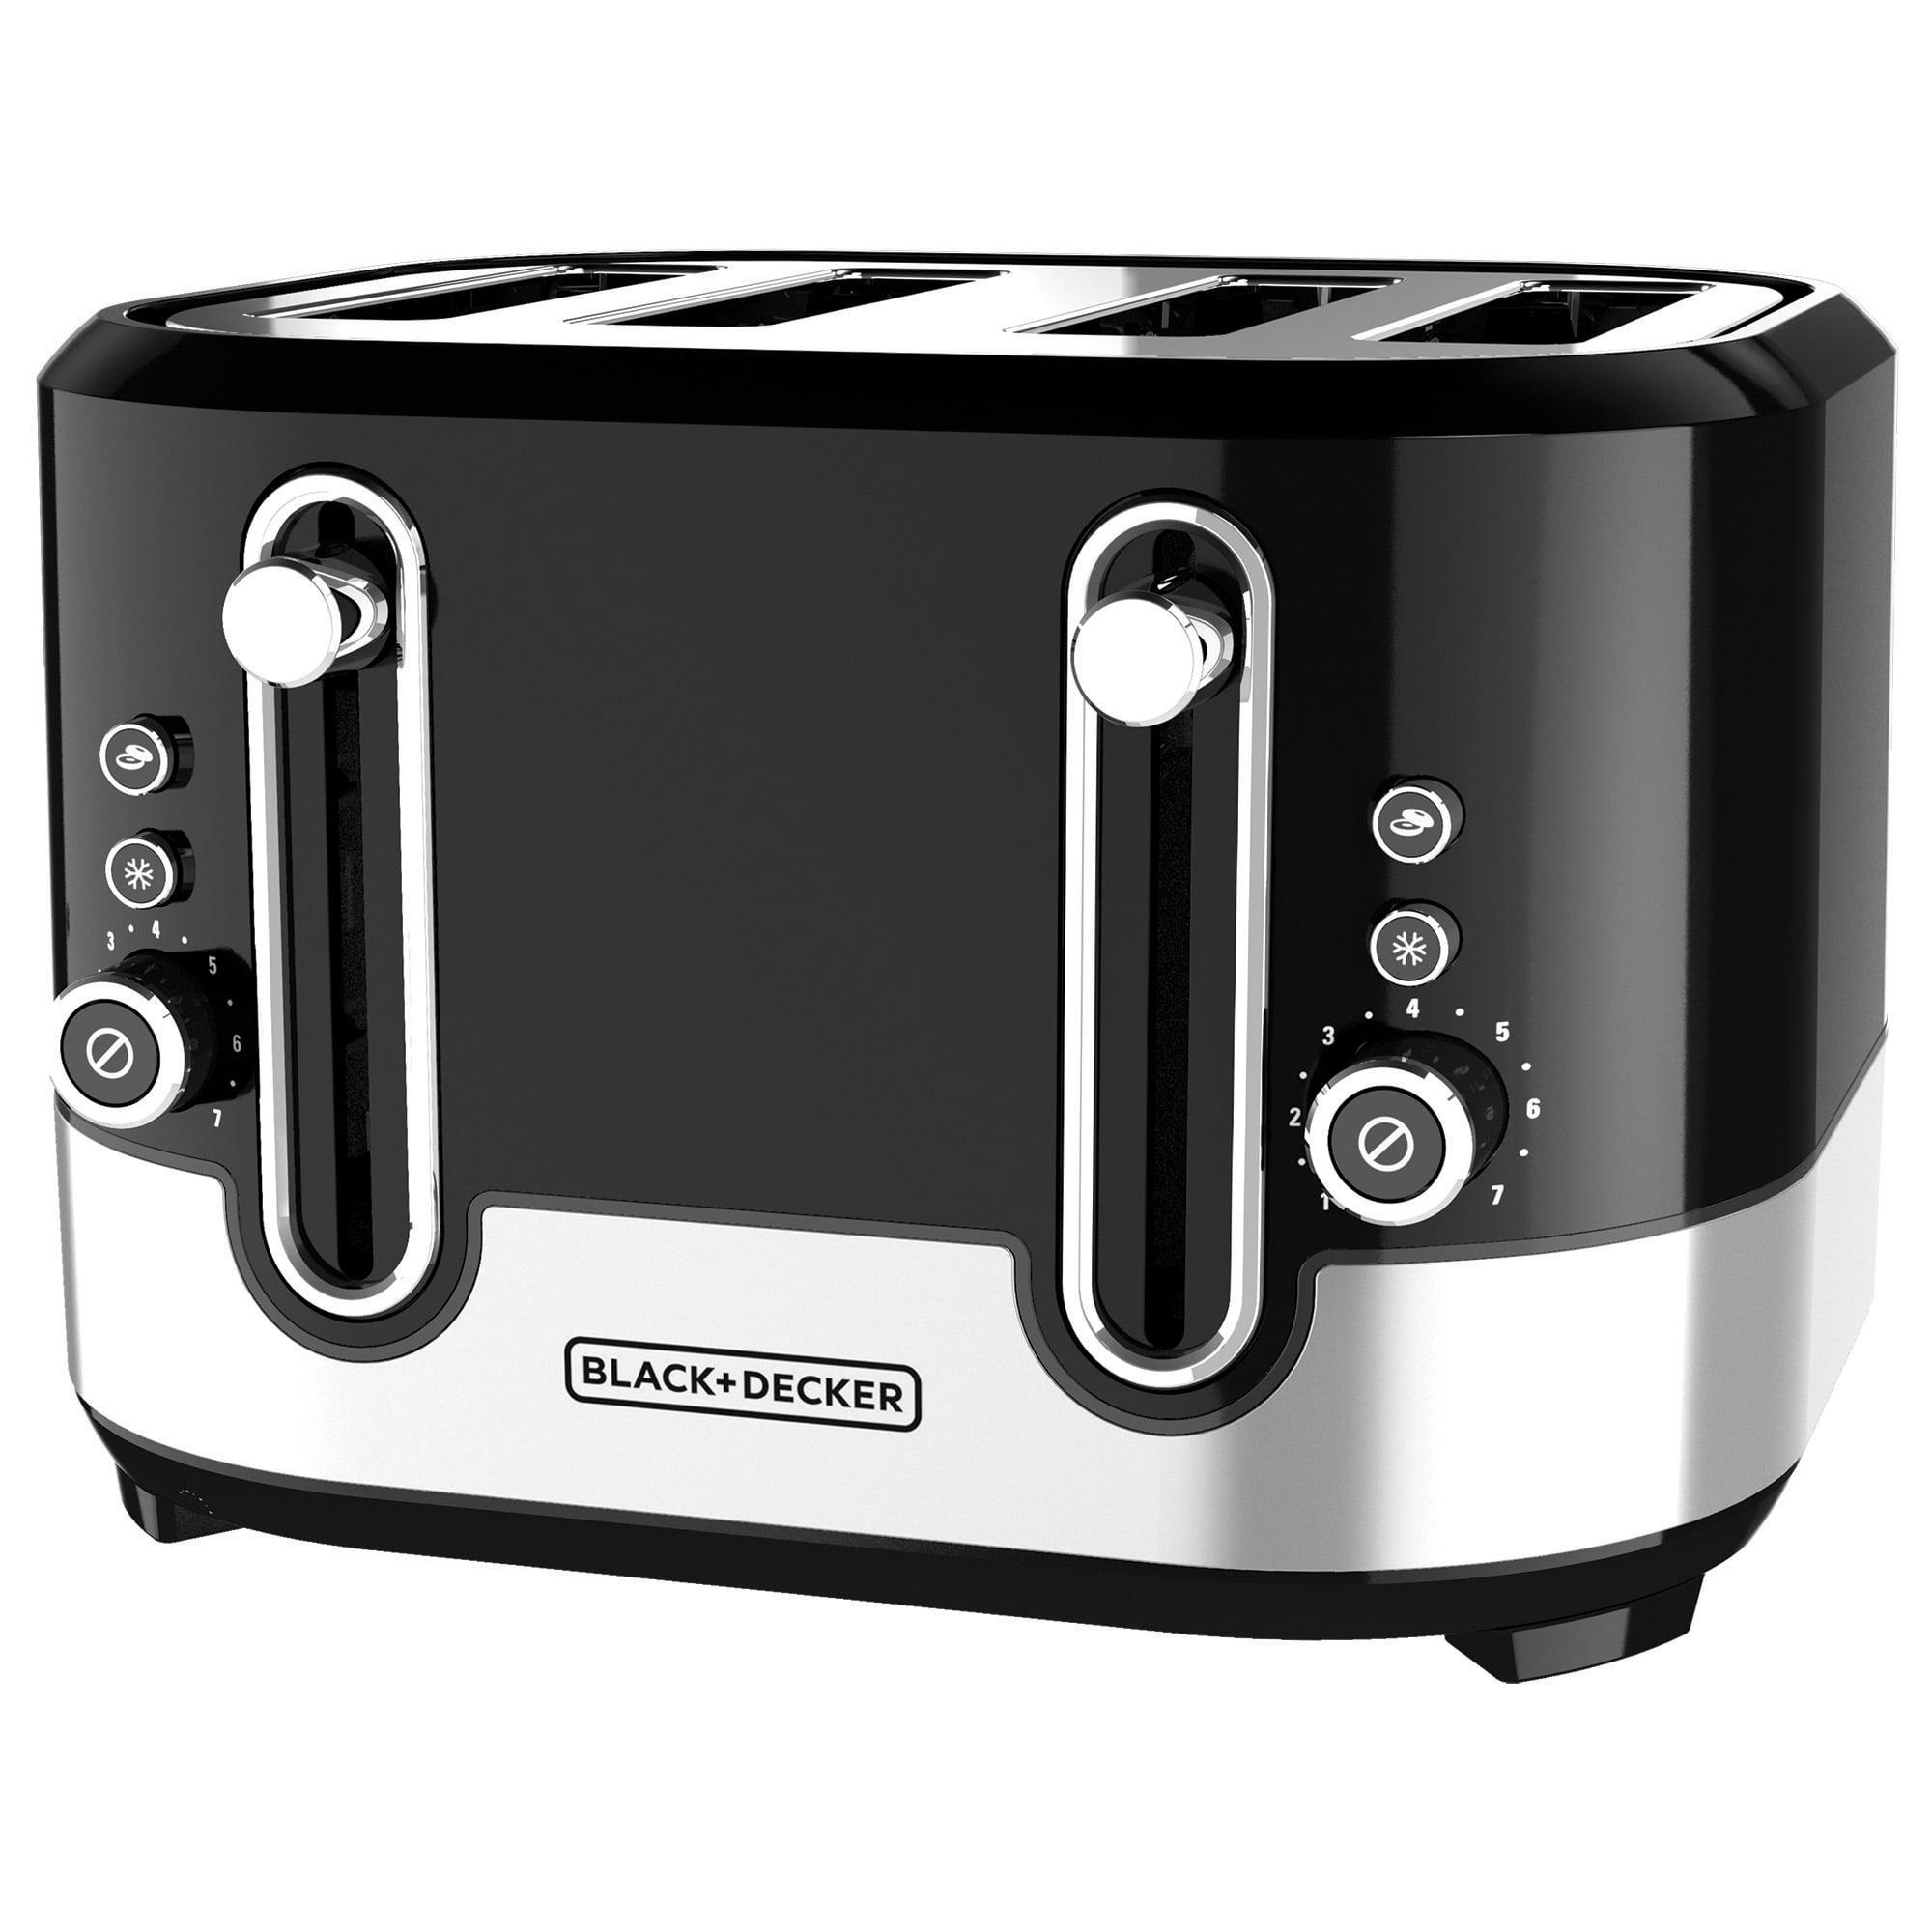 BLACK+DECKER Extra-Wide Slot 4-Slice Toaster, Black/Silver, TR4200SBD